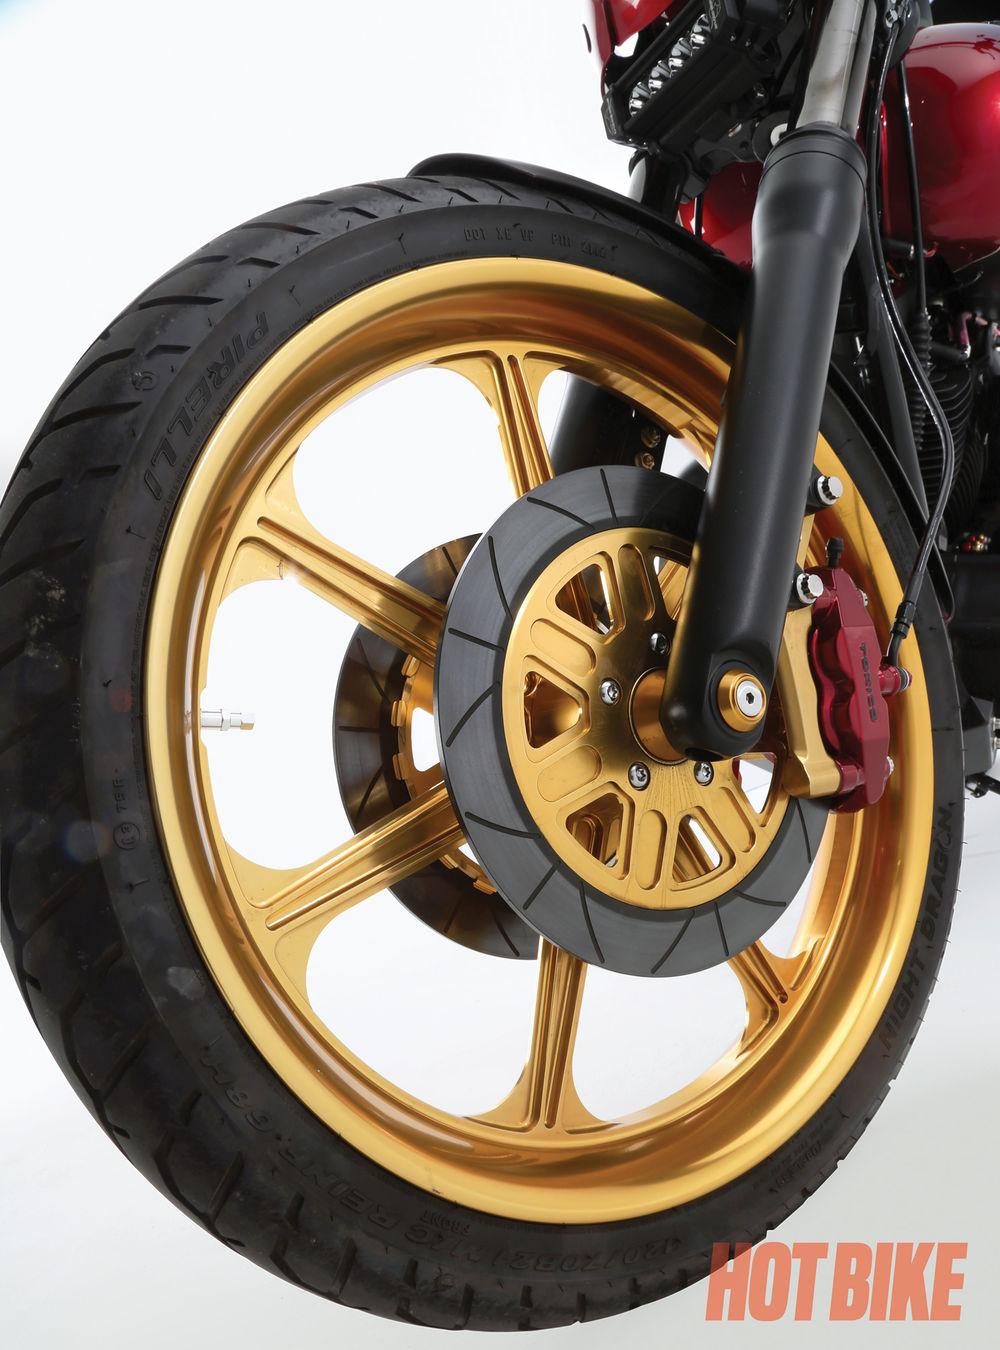 hotbike-alloy-art-2011-dyna-07.jpg